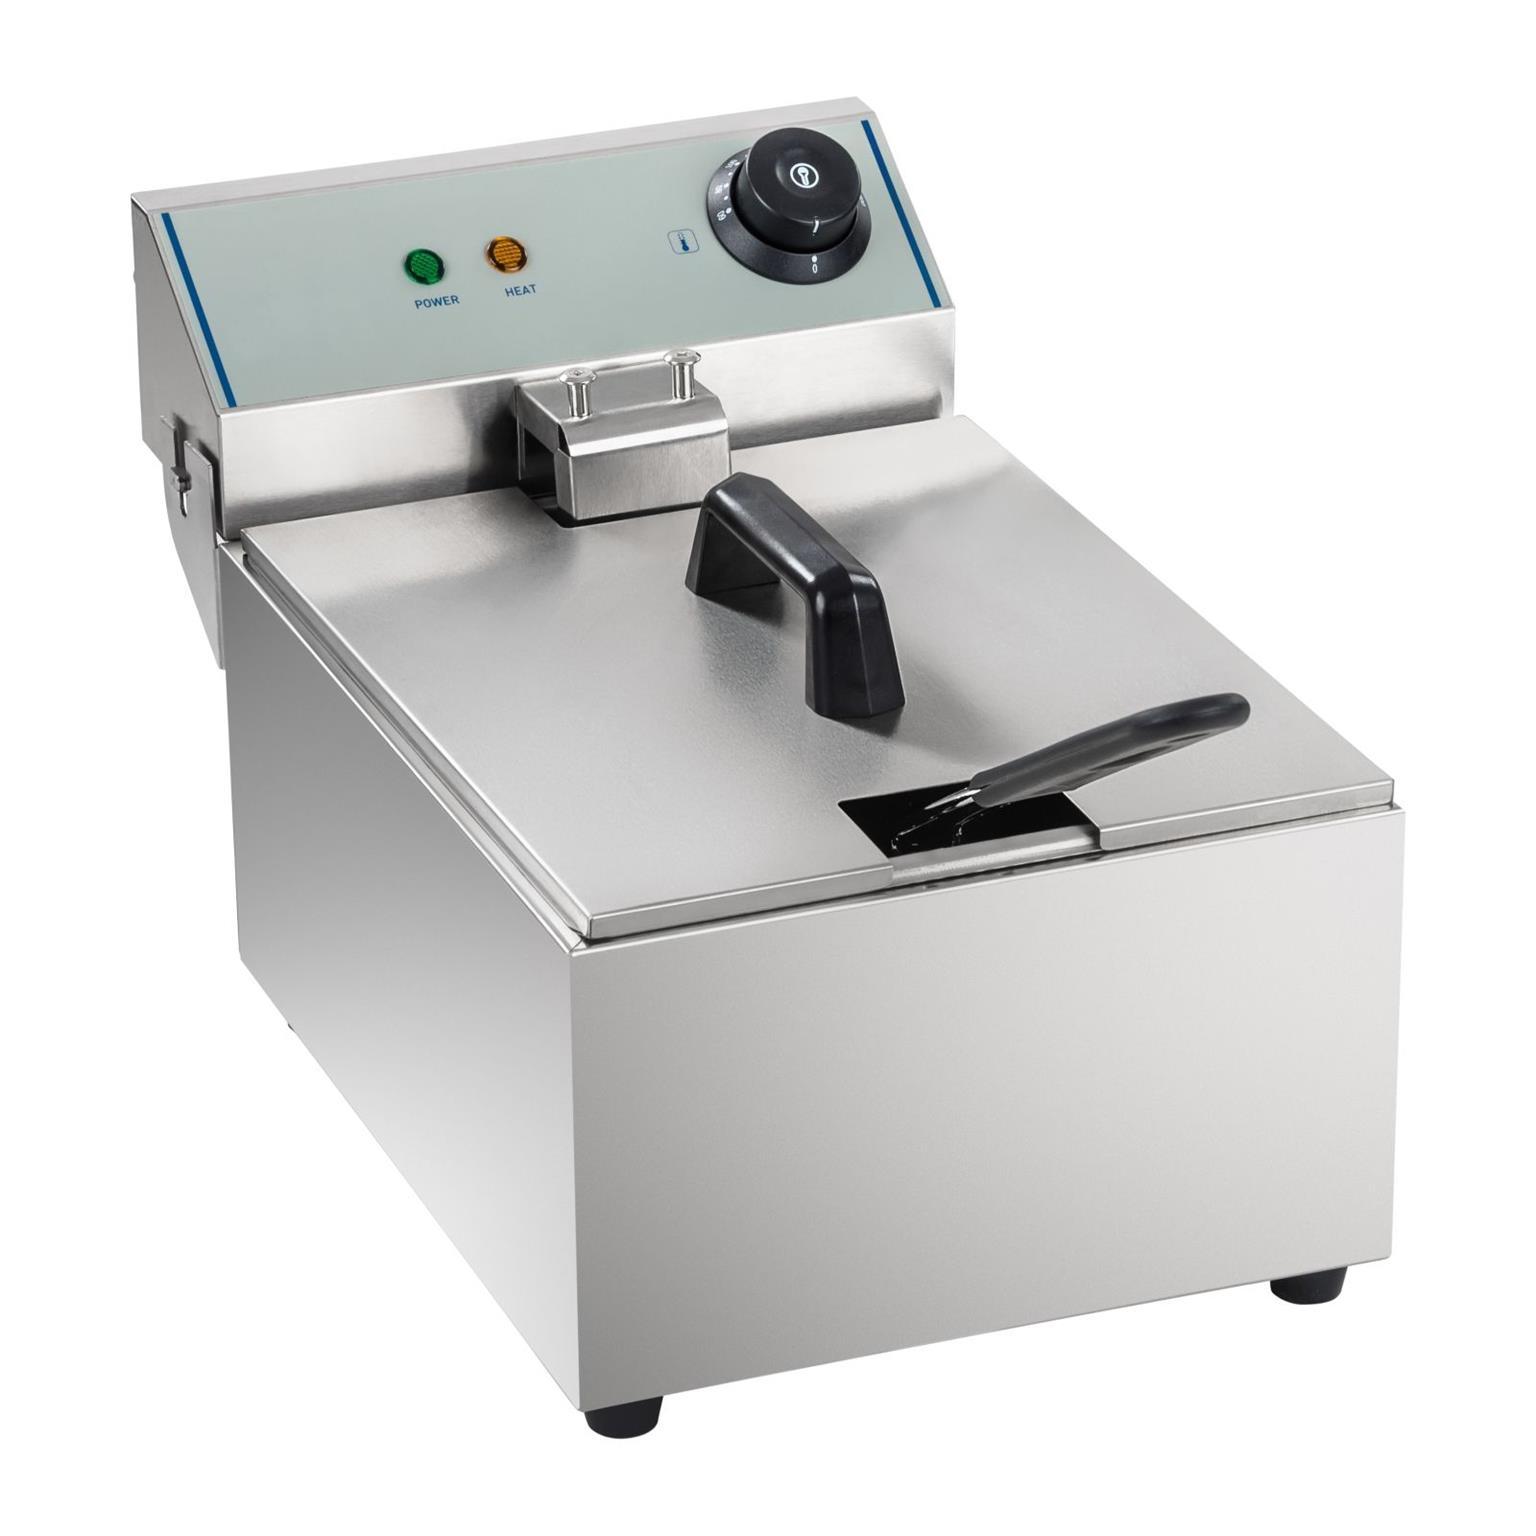 Single Fryer Electric (Exc Vat)